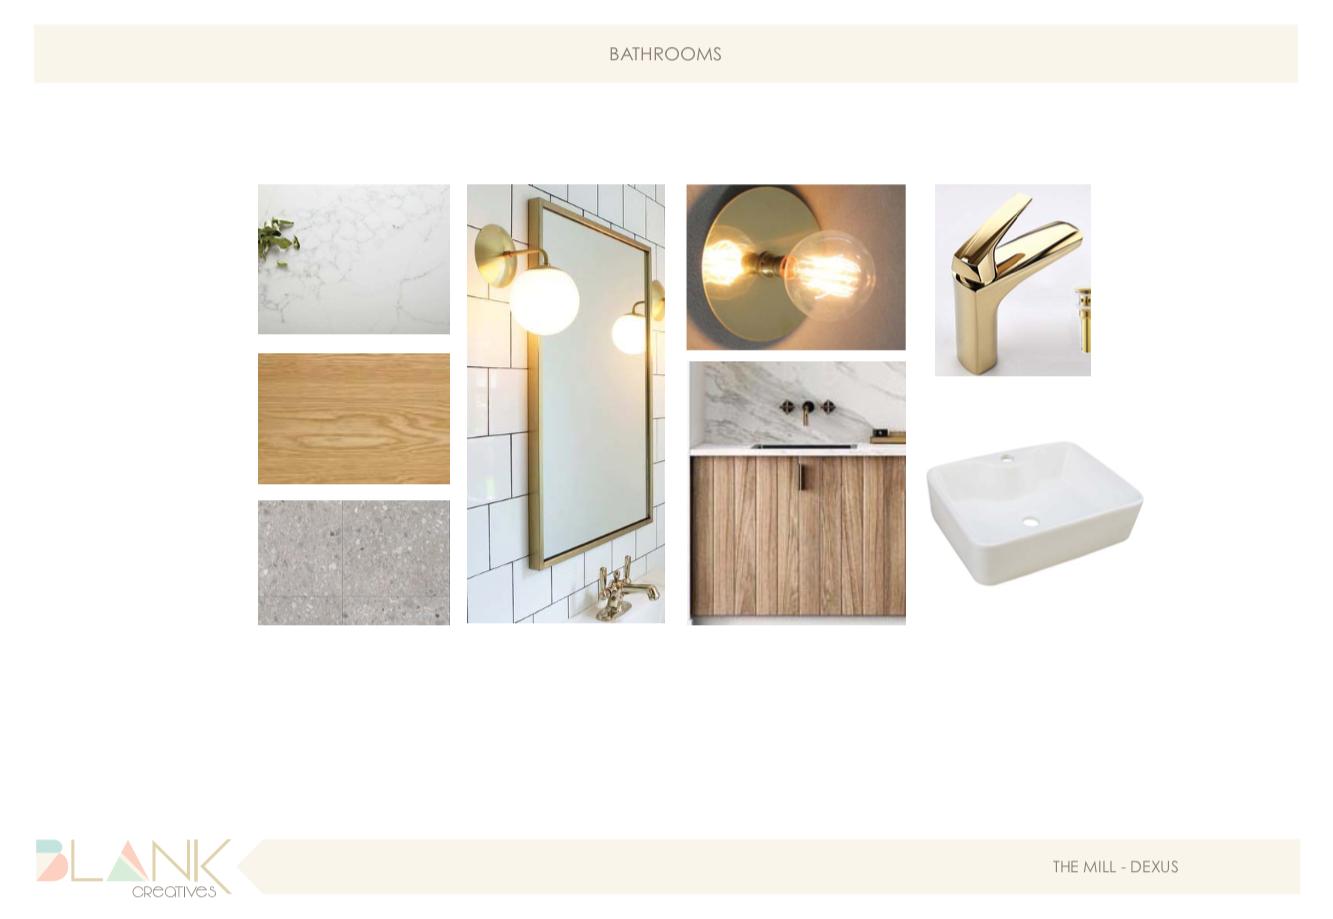 Office interior design bathroom concept.